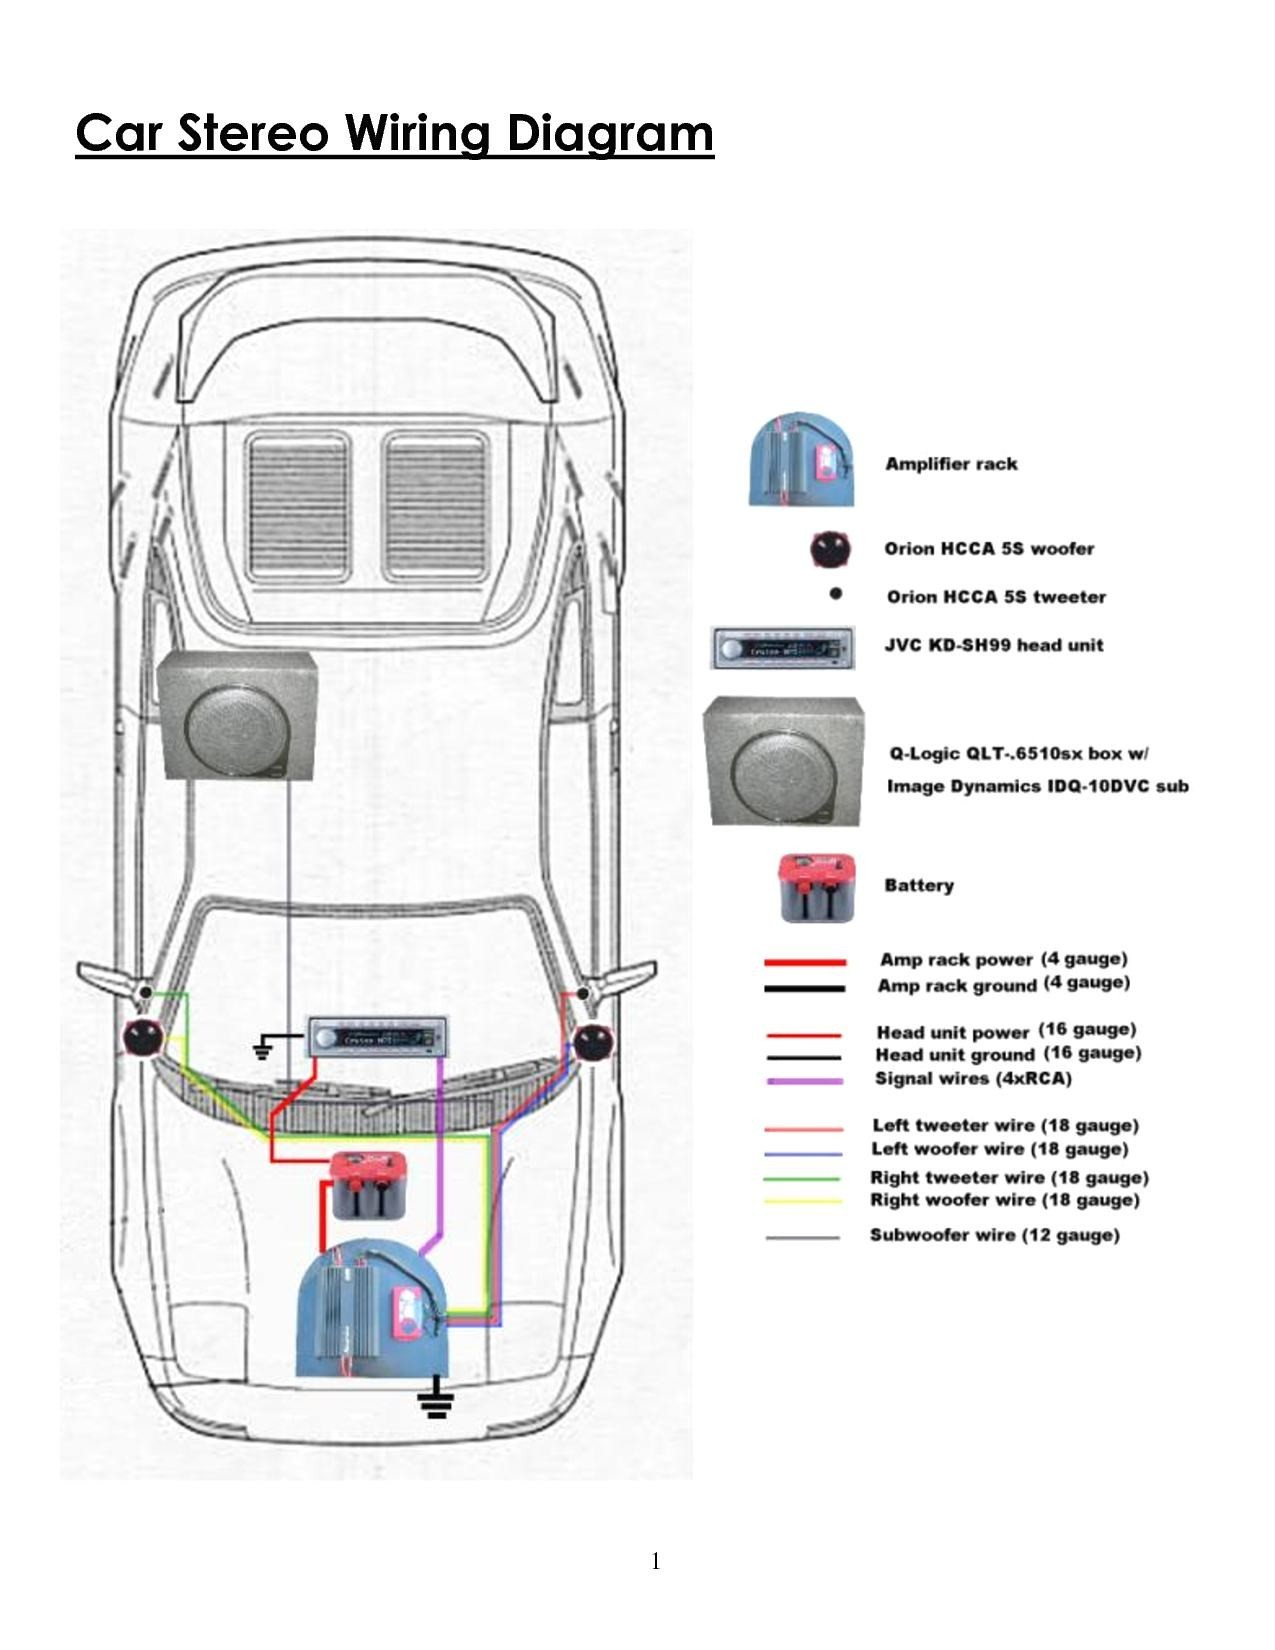 Diagram Of Car Gears Car Subwoofer Wiring Diagram Dual Battery Wiring Data Of Diagram Of Car Gears Car Engine Belt Diagram 50 Unique Stock 2007 Bmw X3 Serpentine Belt